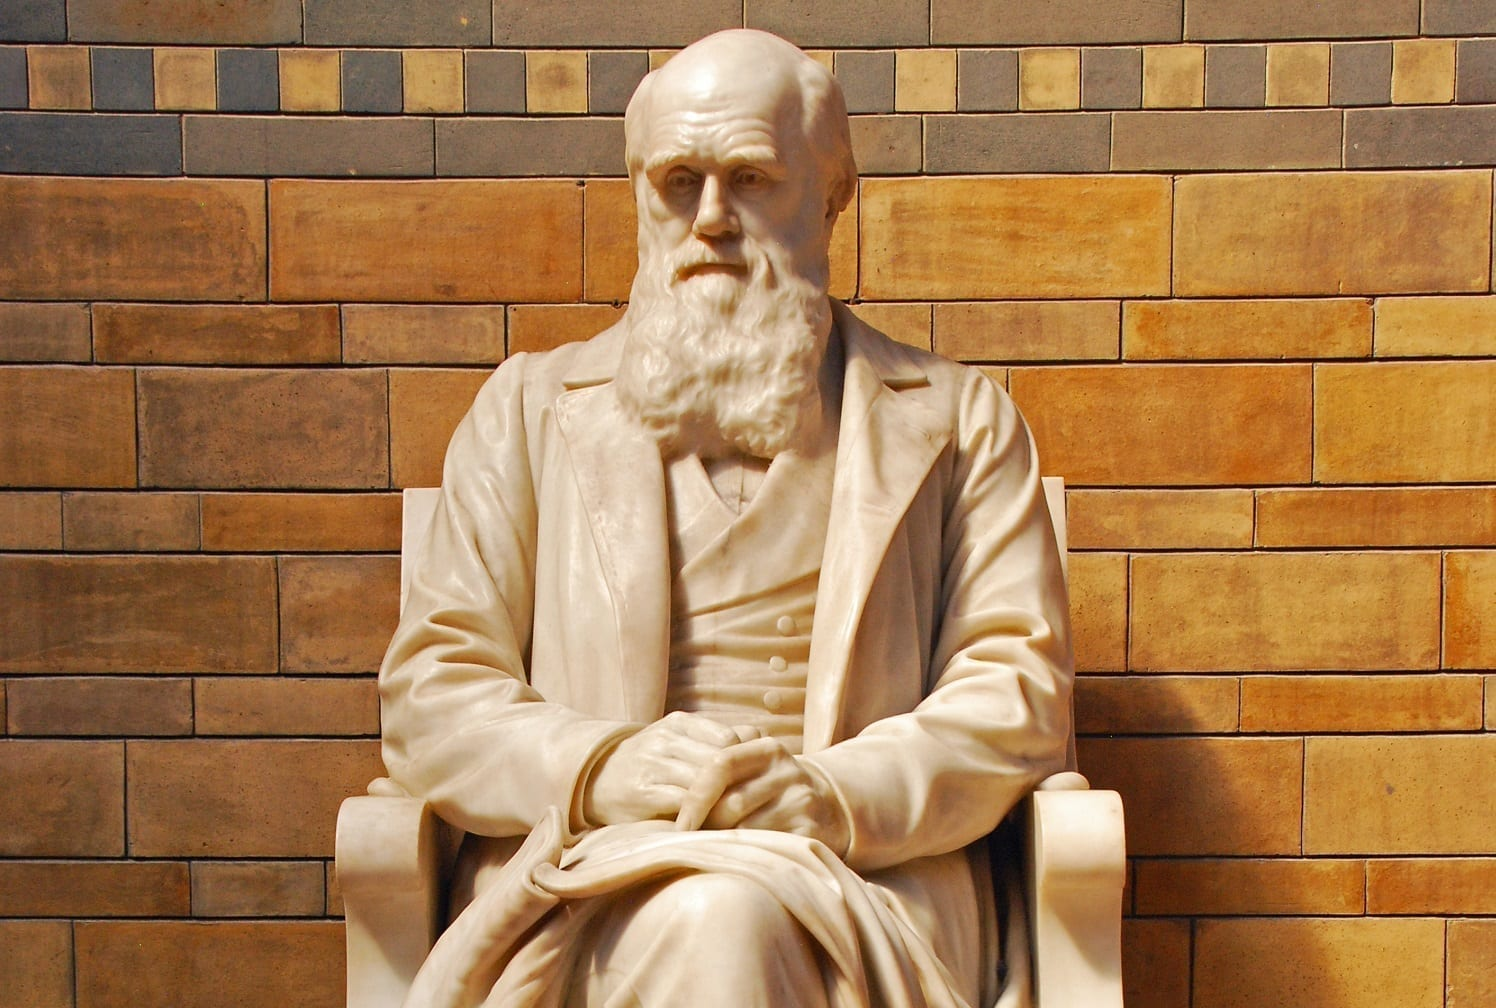 Darwin Statue: © Stbernardstudio | Dreamstime.com File ID: 34106562